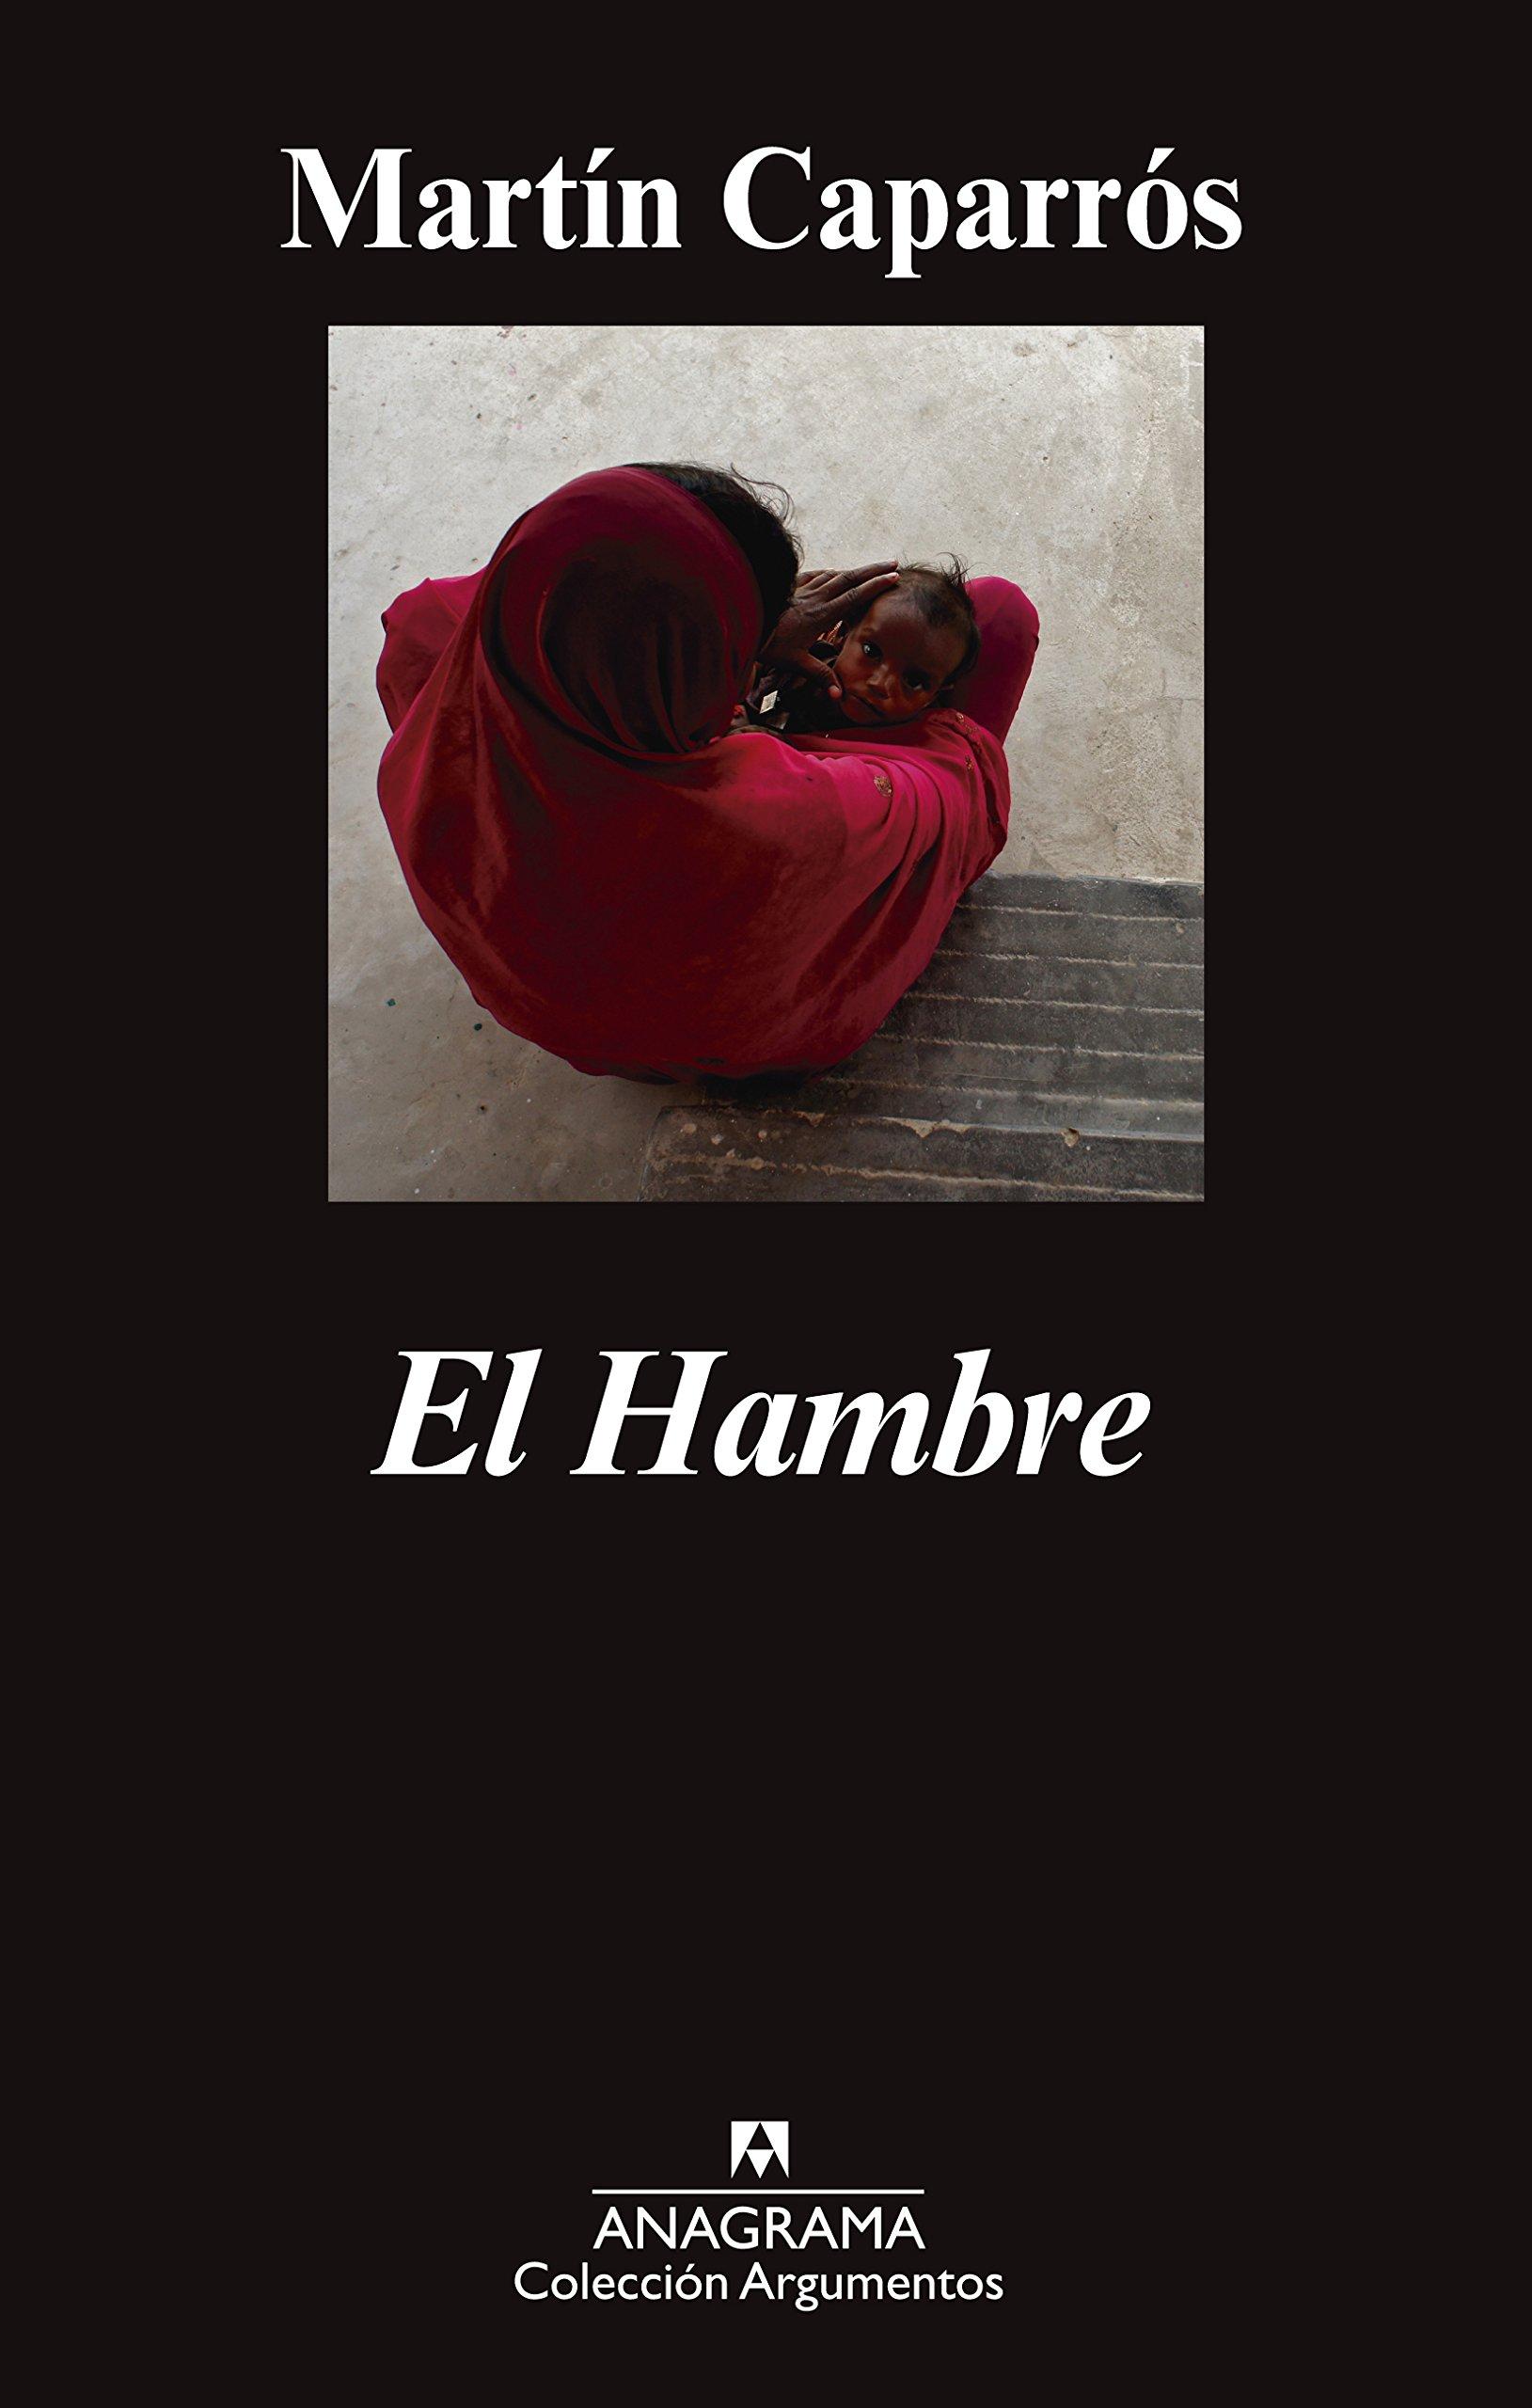 El hambre ISBN-13 9788433963772